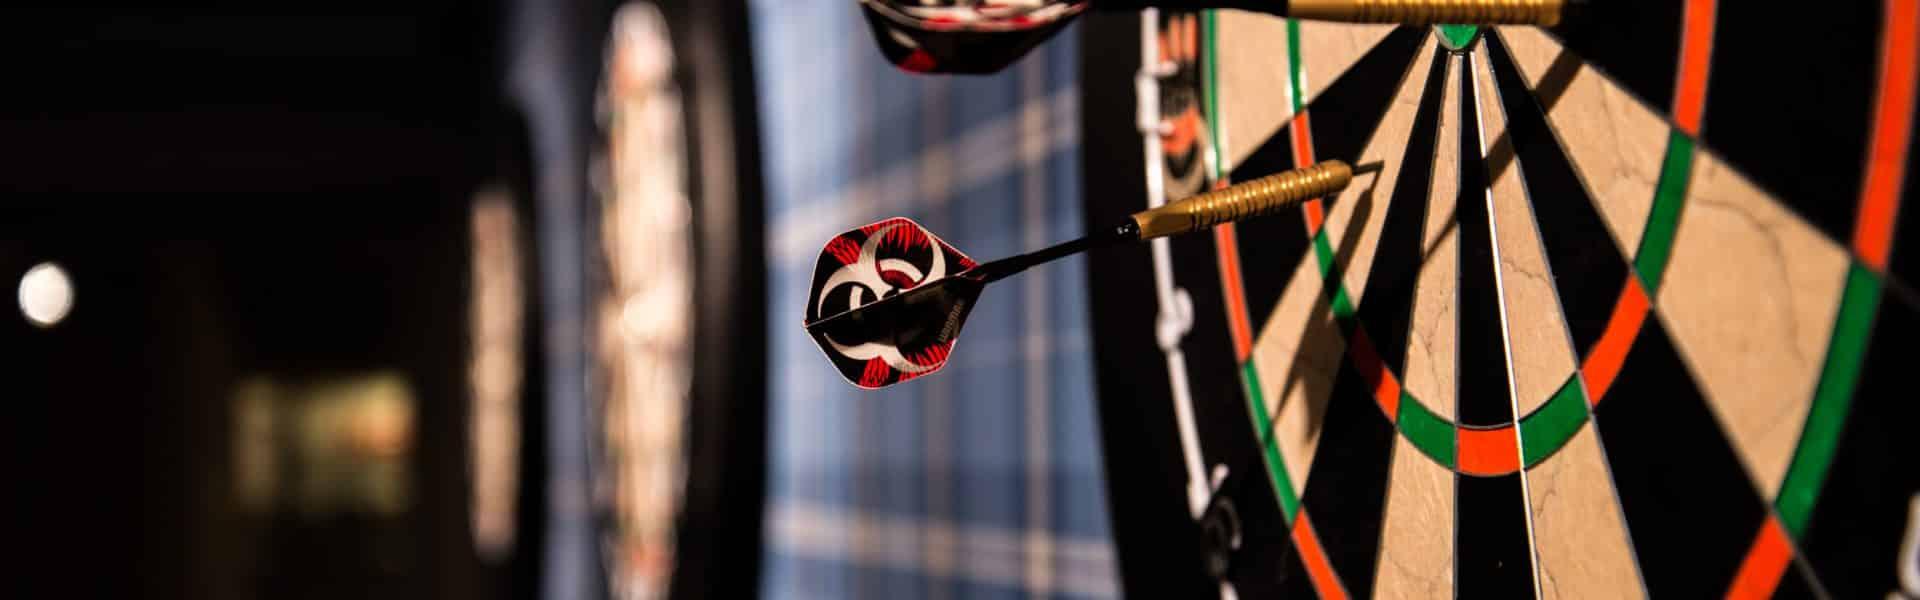 Spela Dart i Stockholm hos Birka Bowling